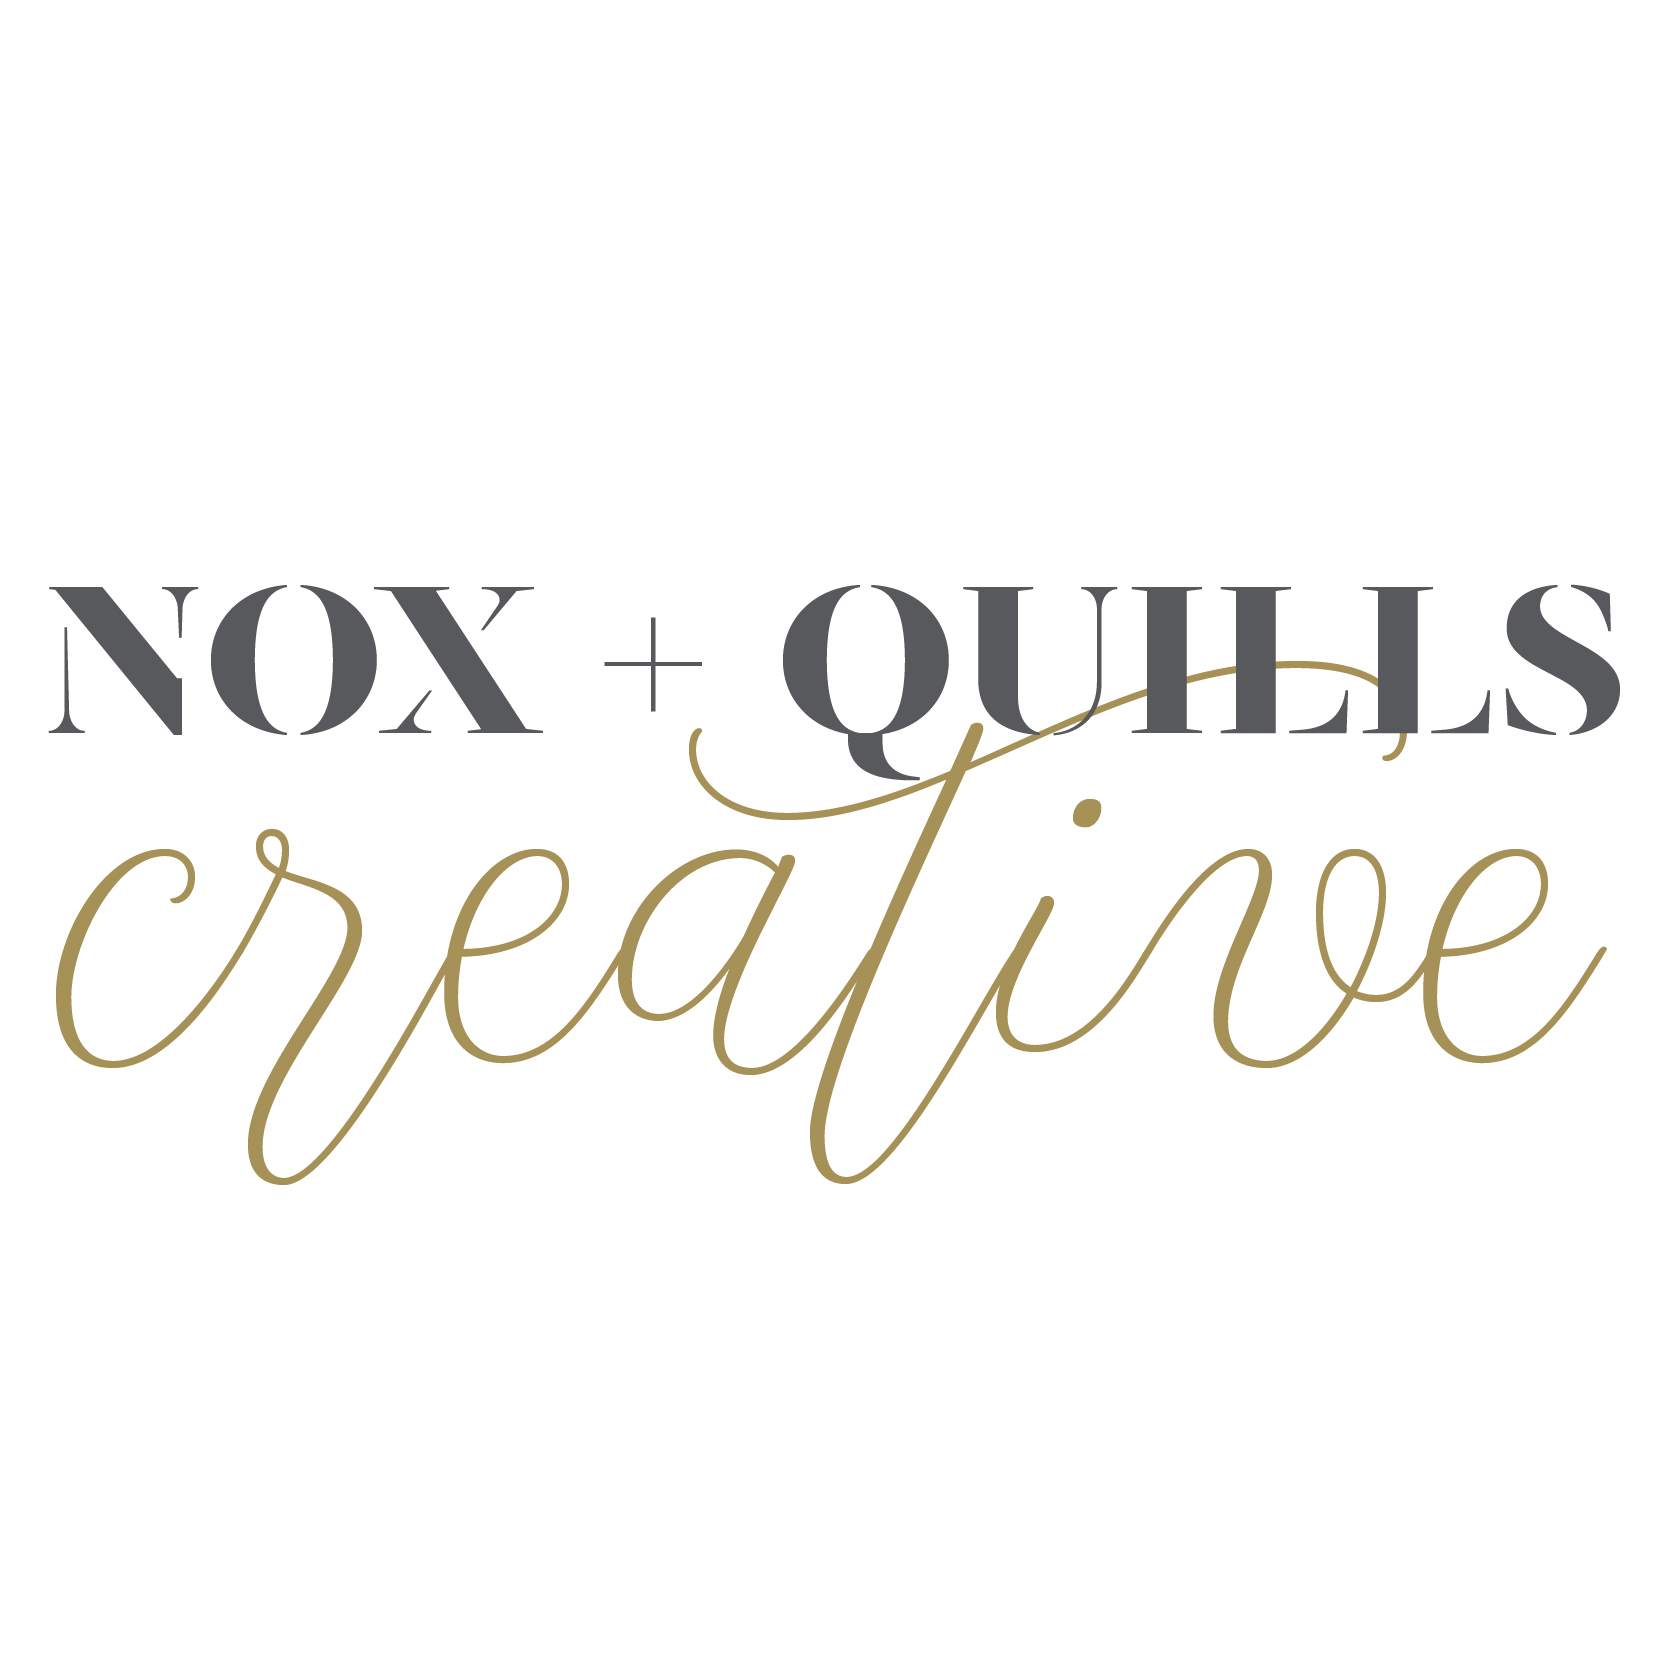 Nox + Quills Creative avatar